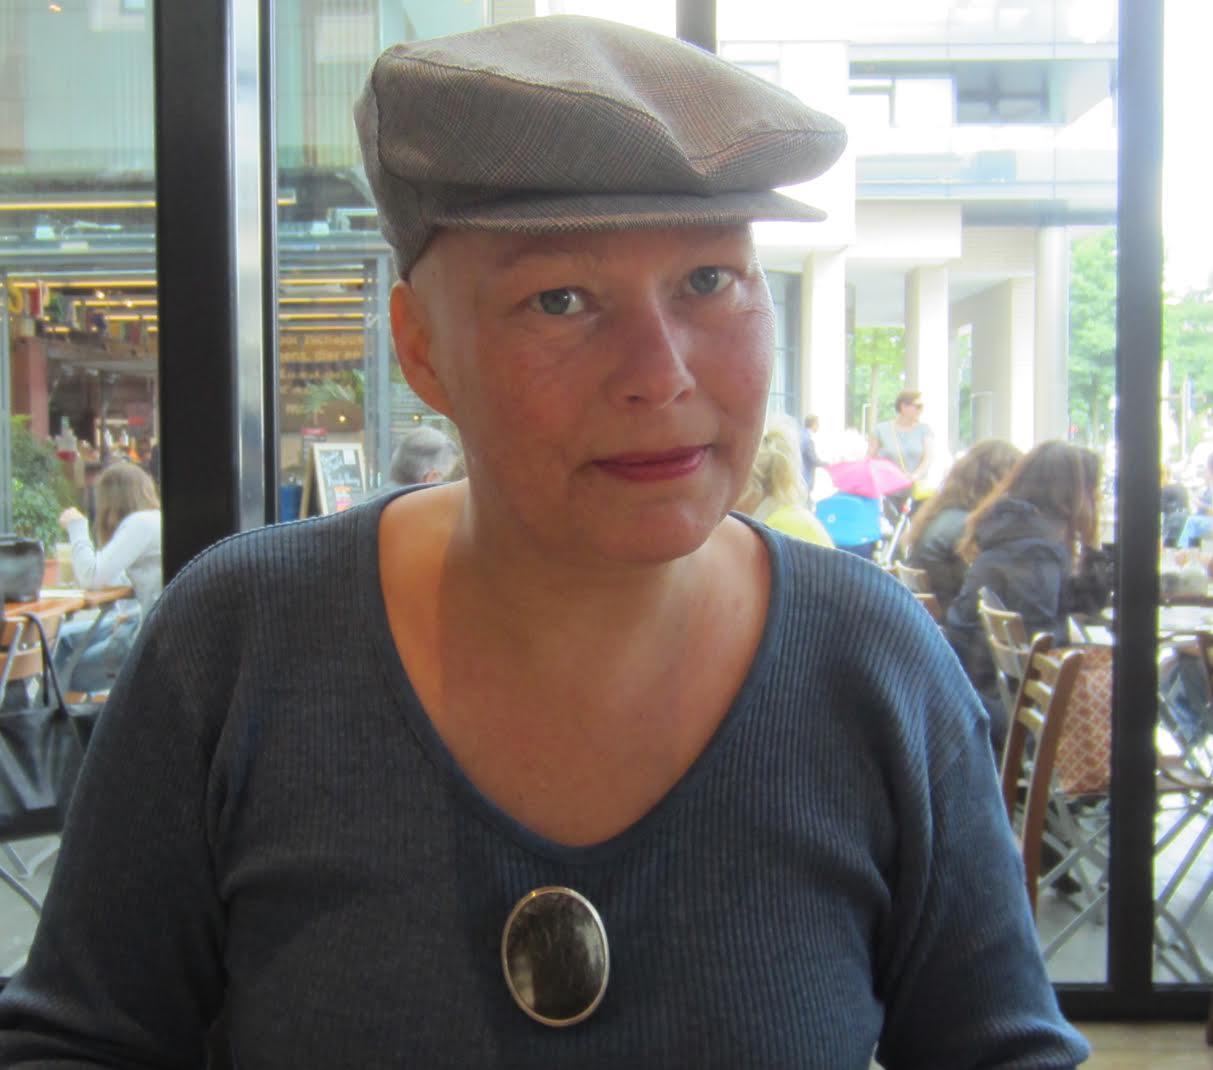 Esther Doornbusch draagt Akihiro Ikeyama, Cow I, broche, Amsterdam, 2017. Foto met dak aan M.O.©